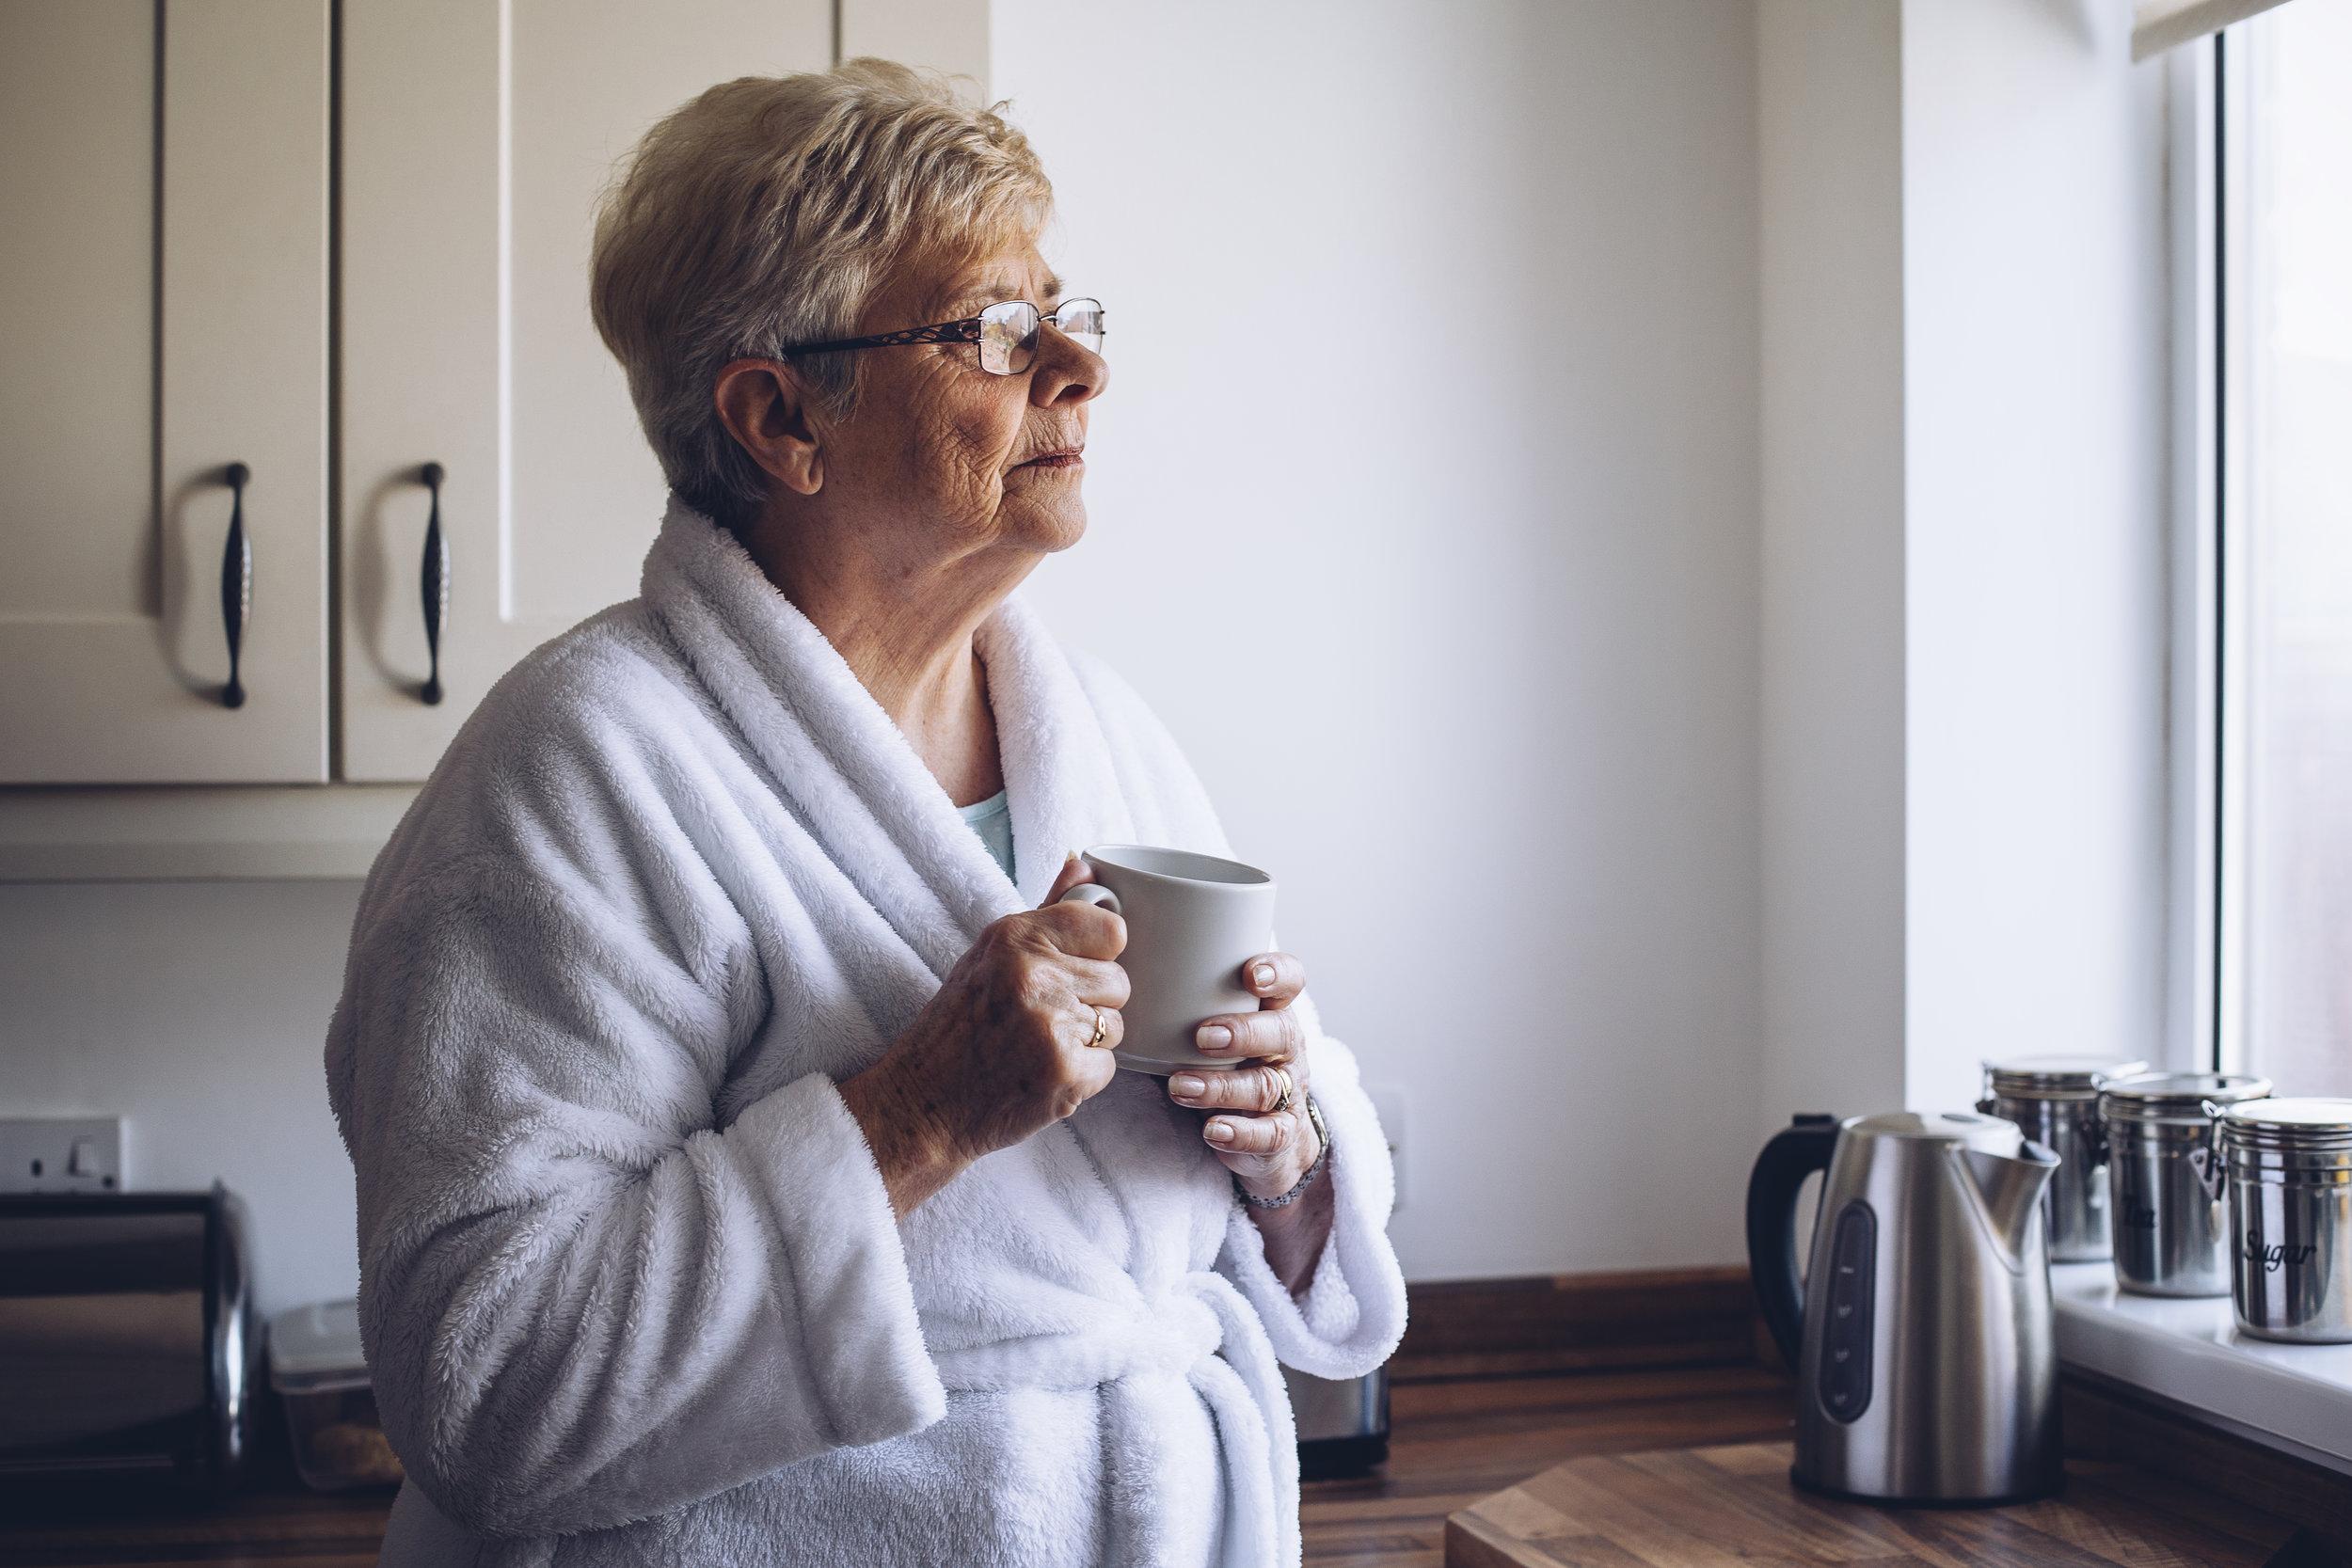 Senior-Woman-Looking-out-Window-602318816_5053x3369.jpeg